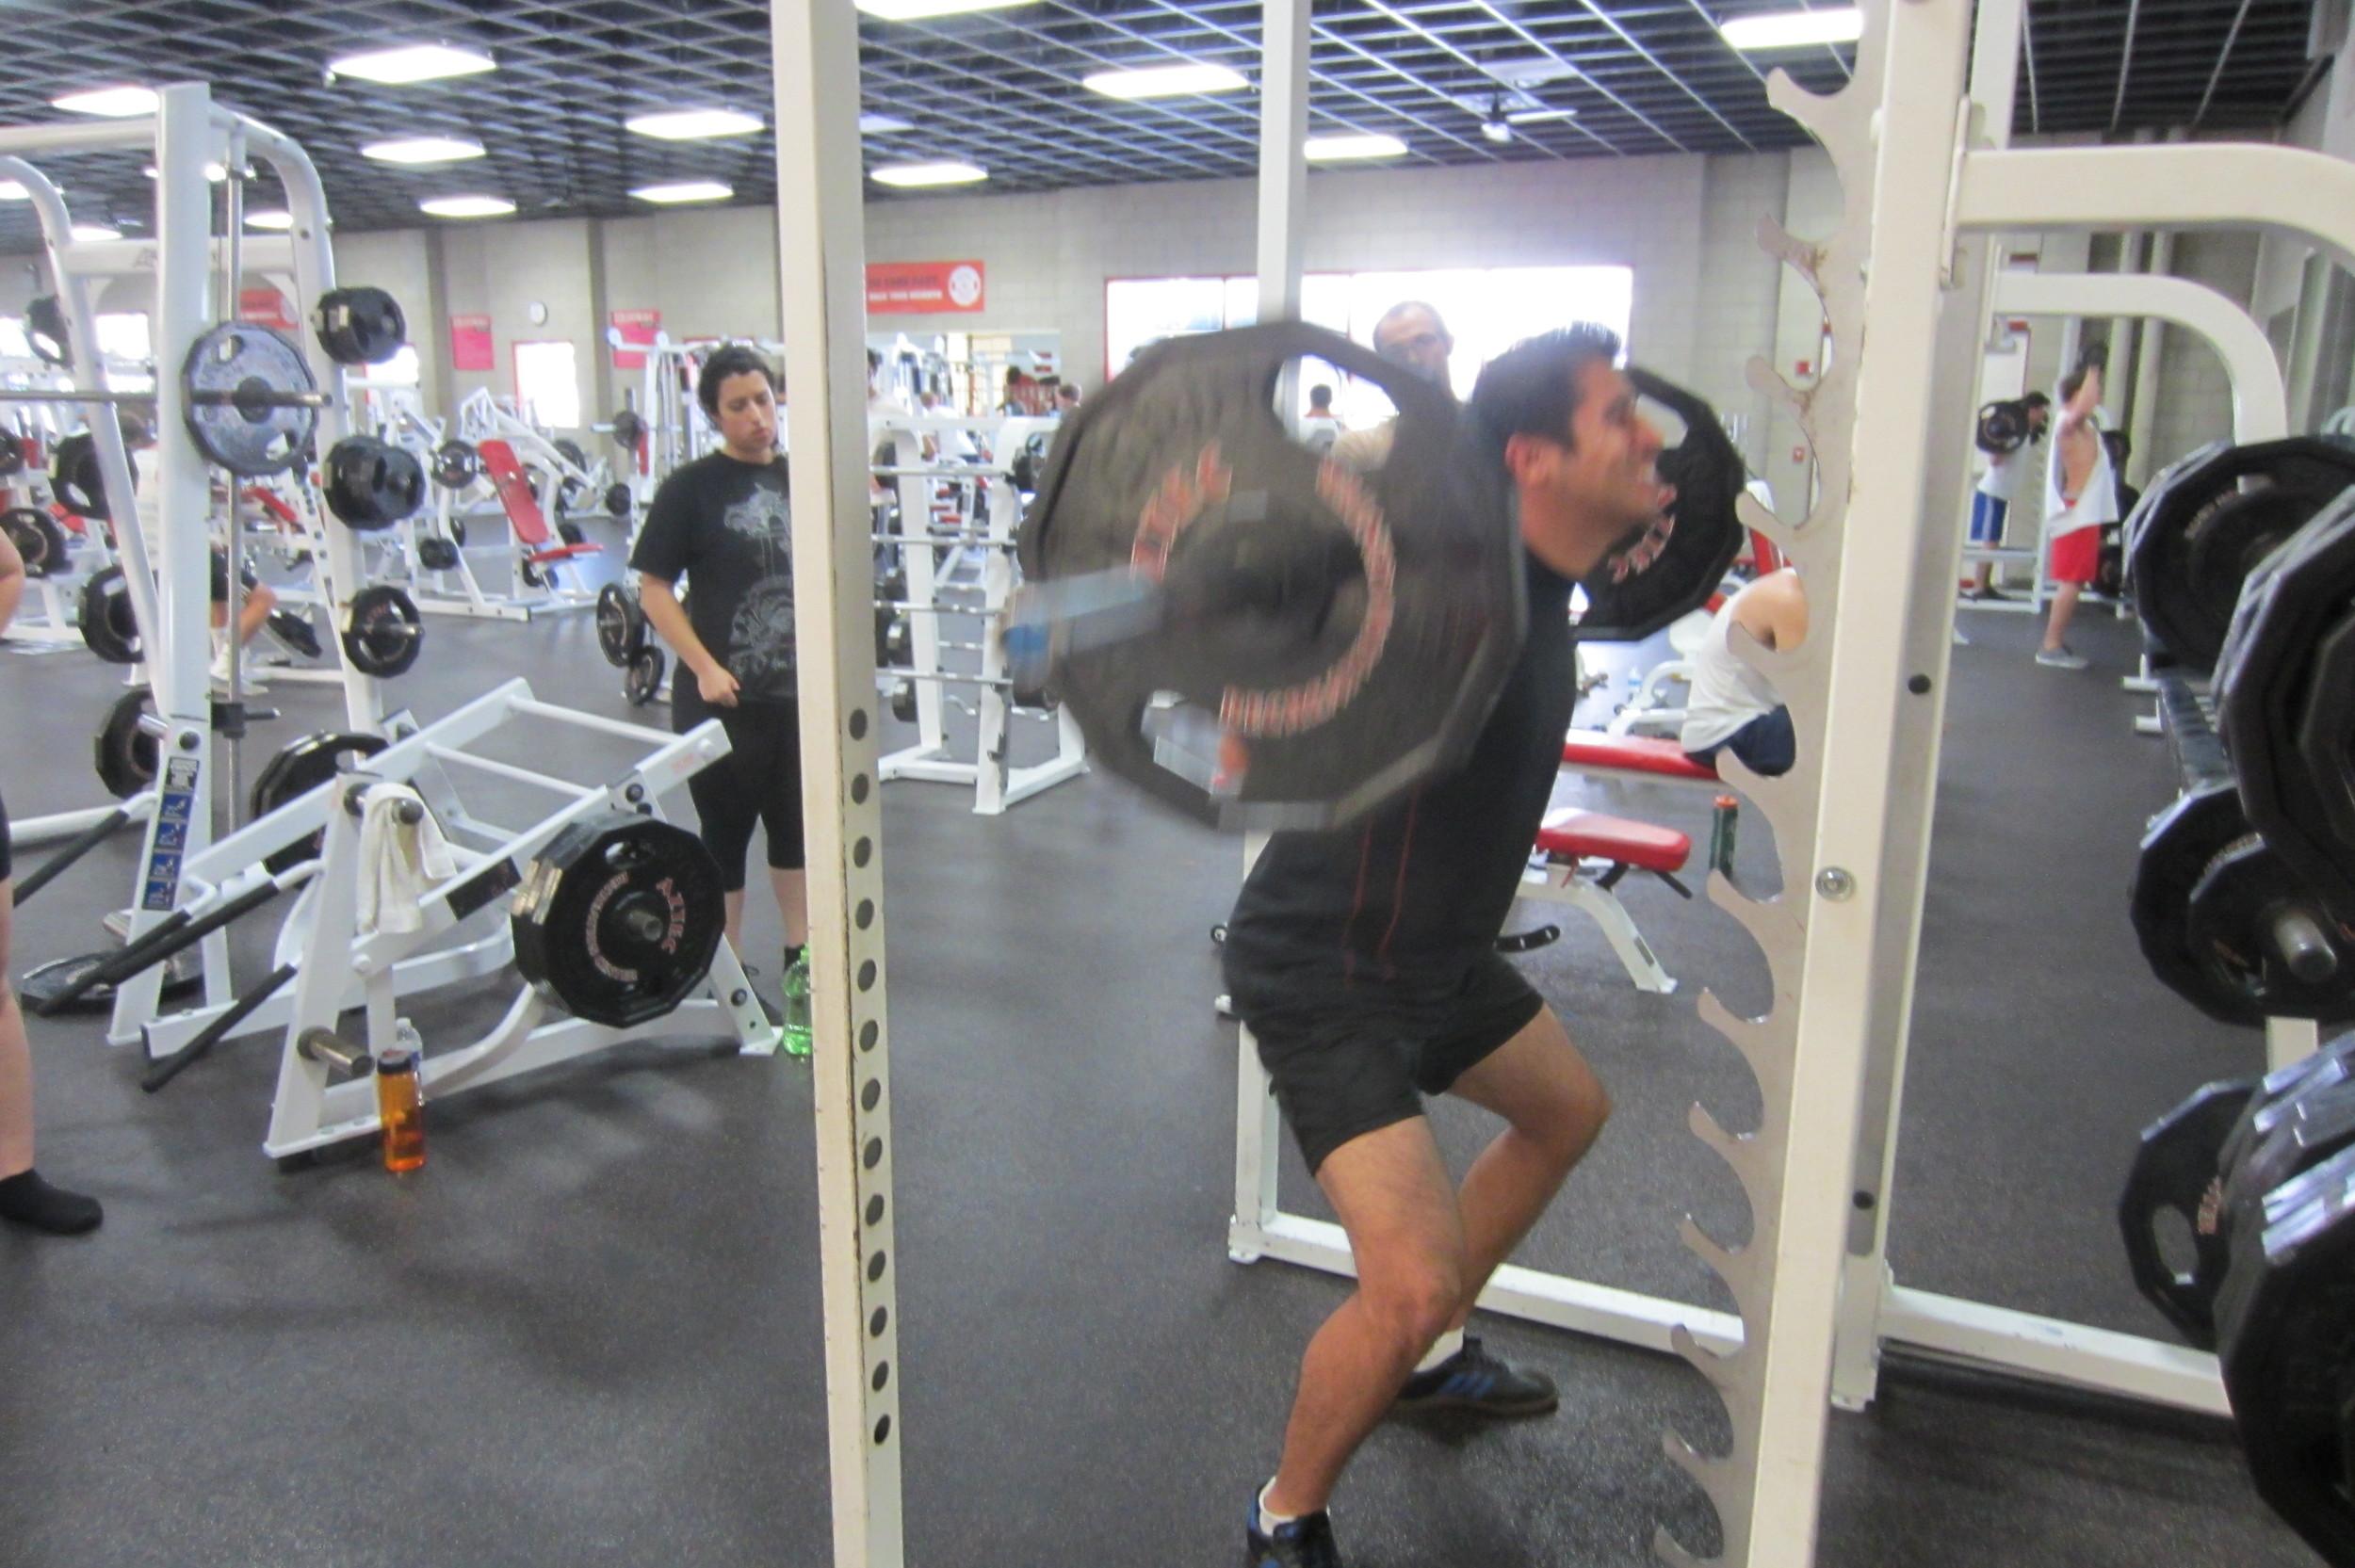 Loading the Squat